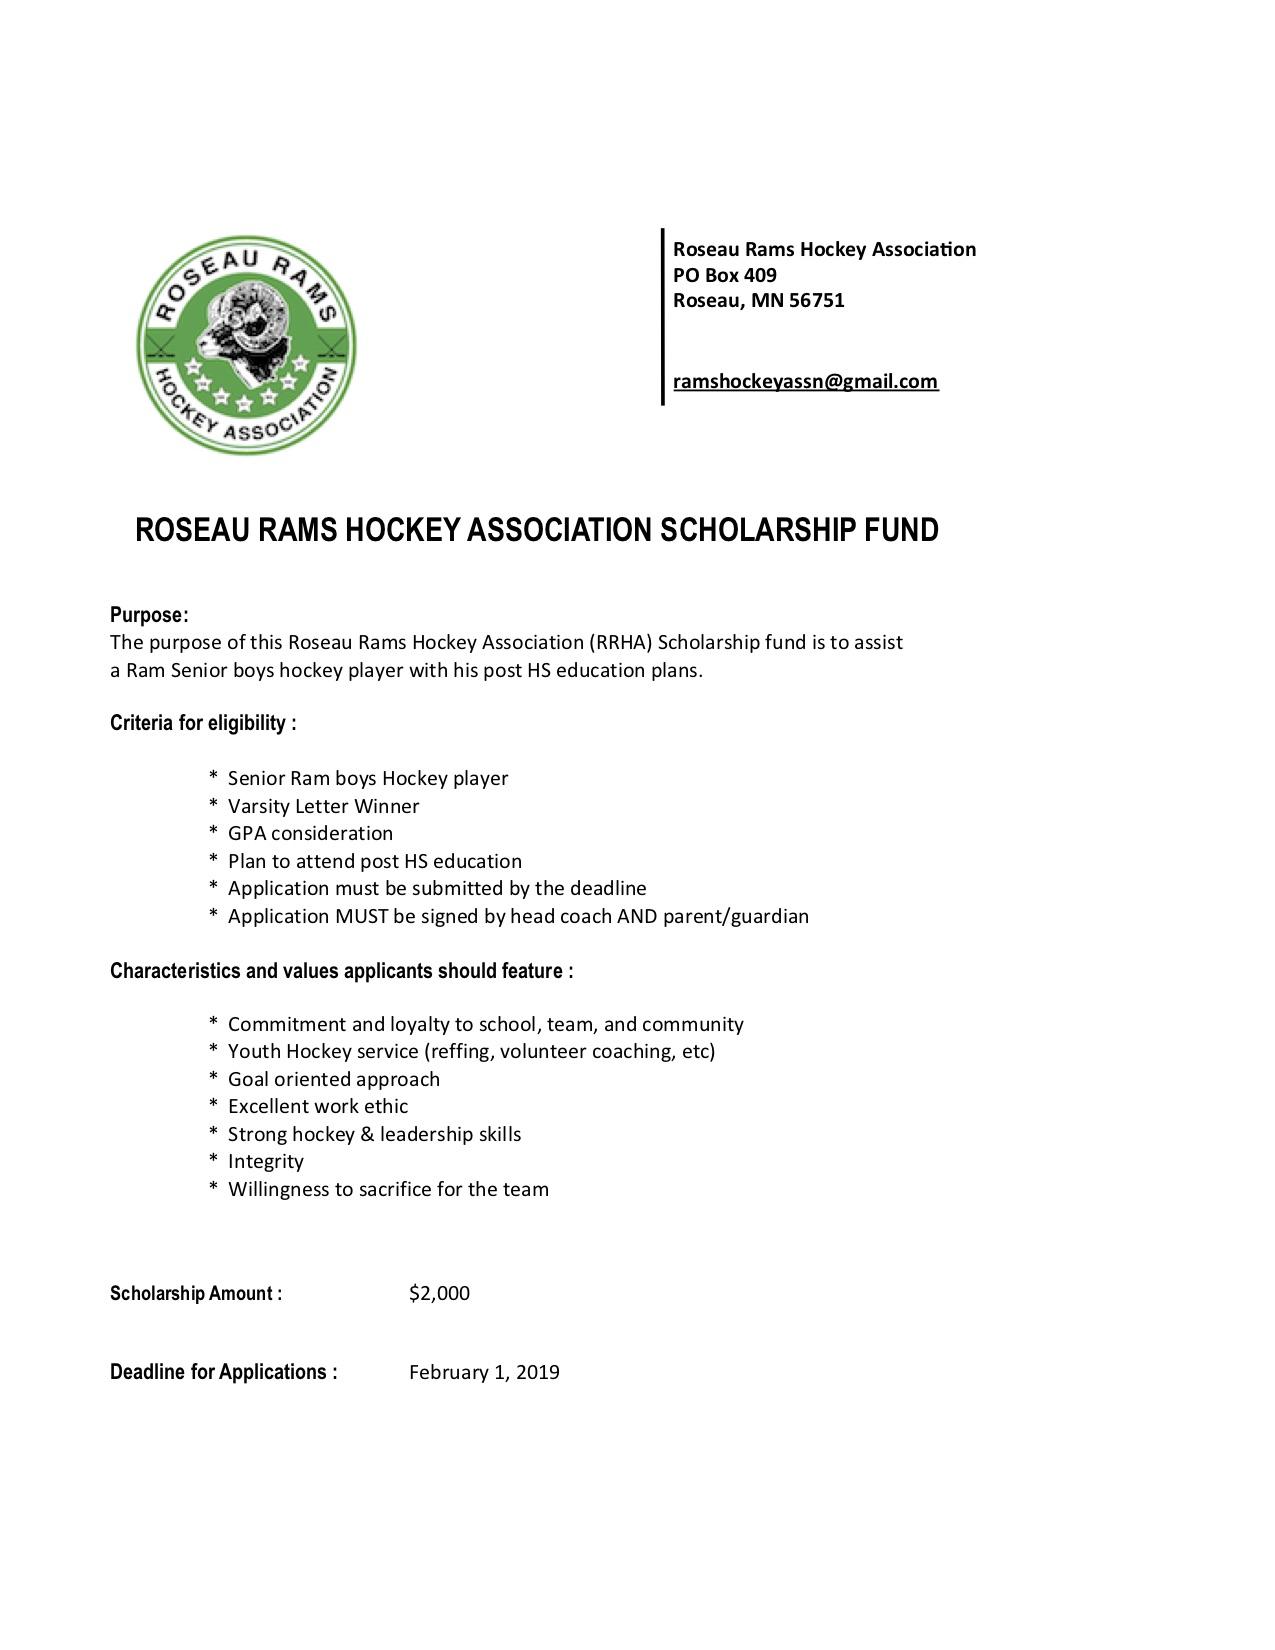 RRHA Scholarship.jpg